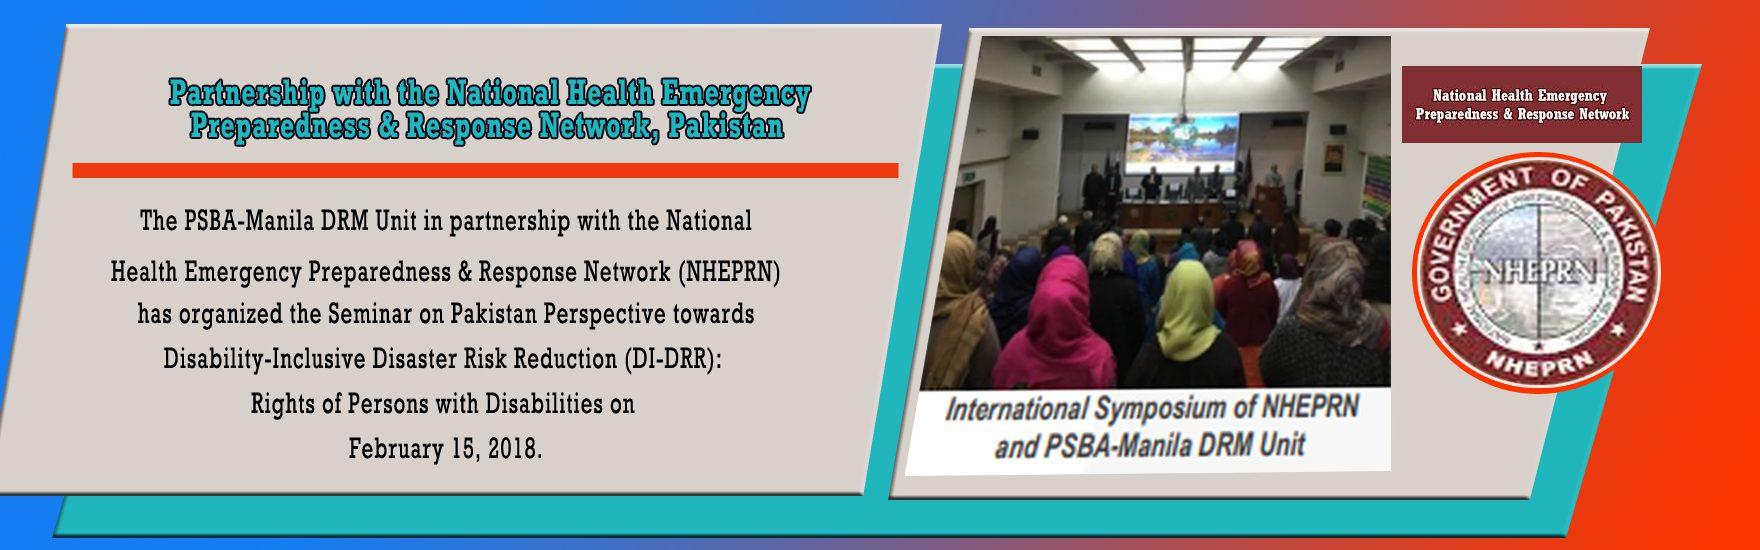 Partnership with the National Health Emergency Preparedness & Response Network, Pakistan